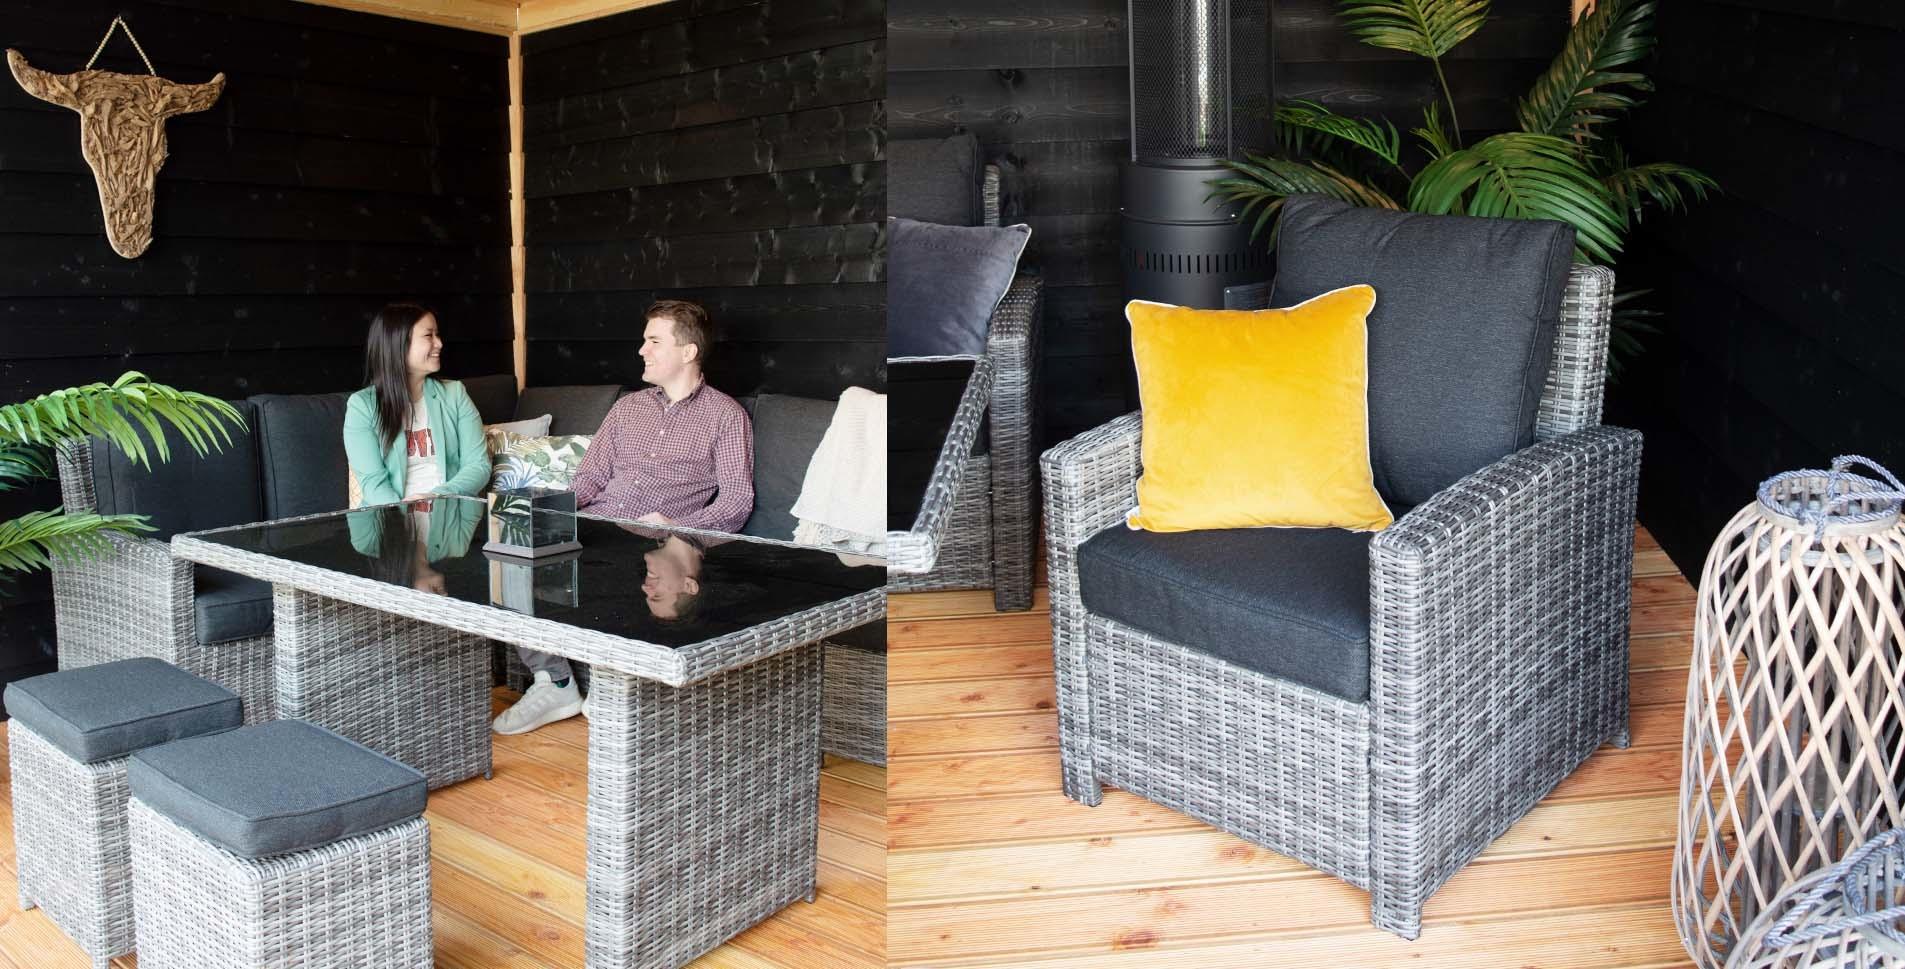 Industriële overkapping met loungeset